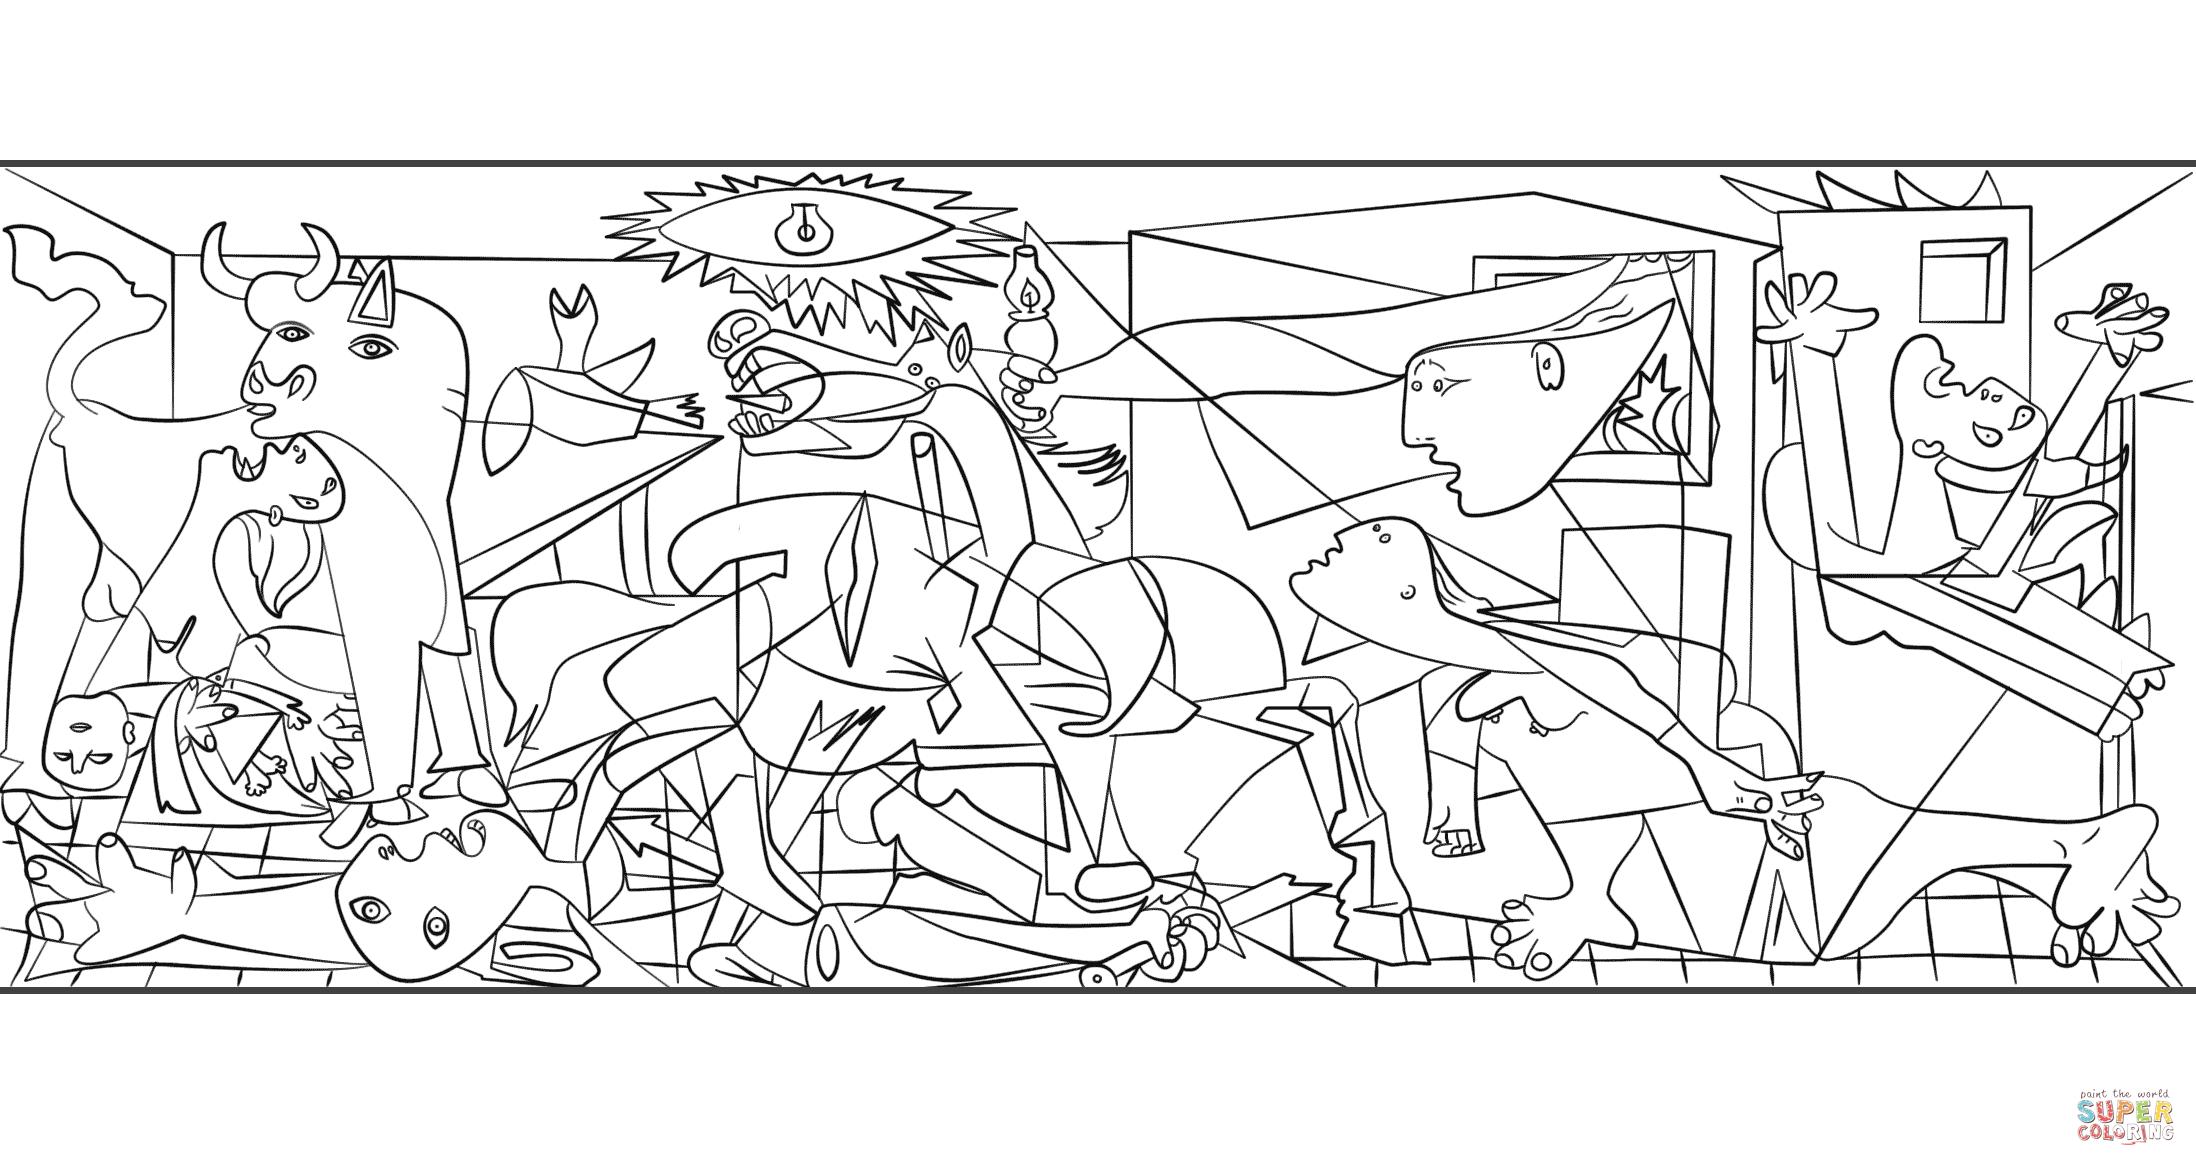 Dibujo De Guernica De Pablo Picasso Para Colorear